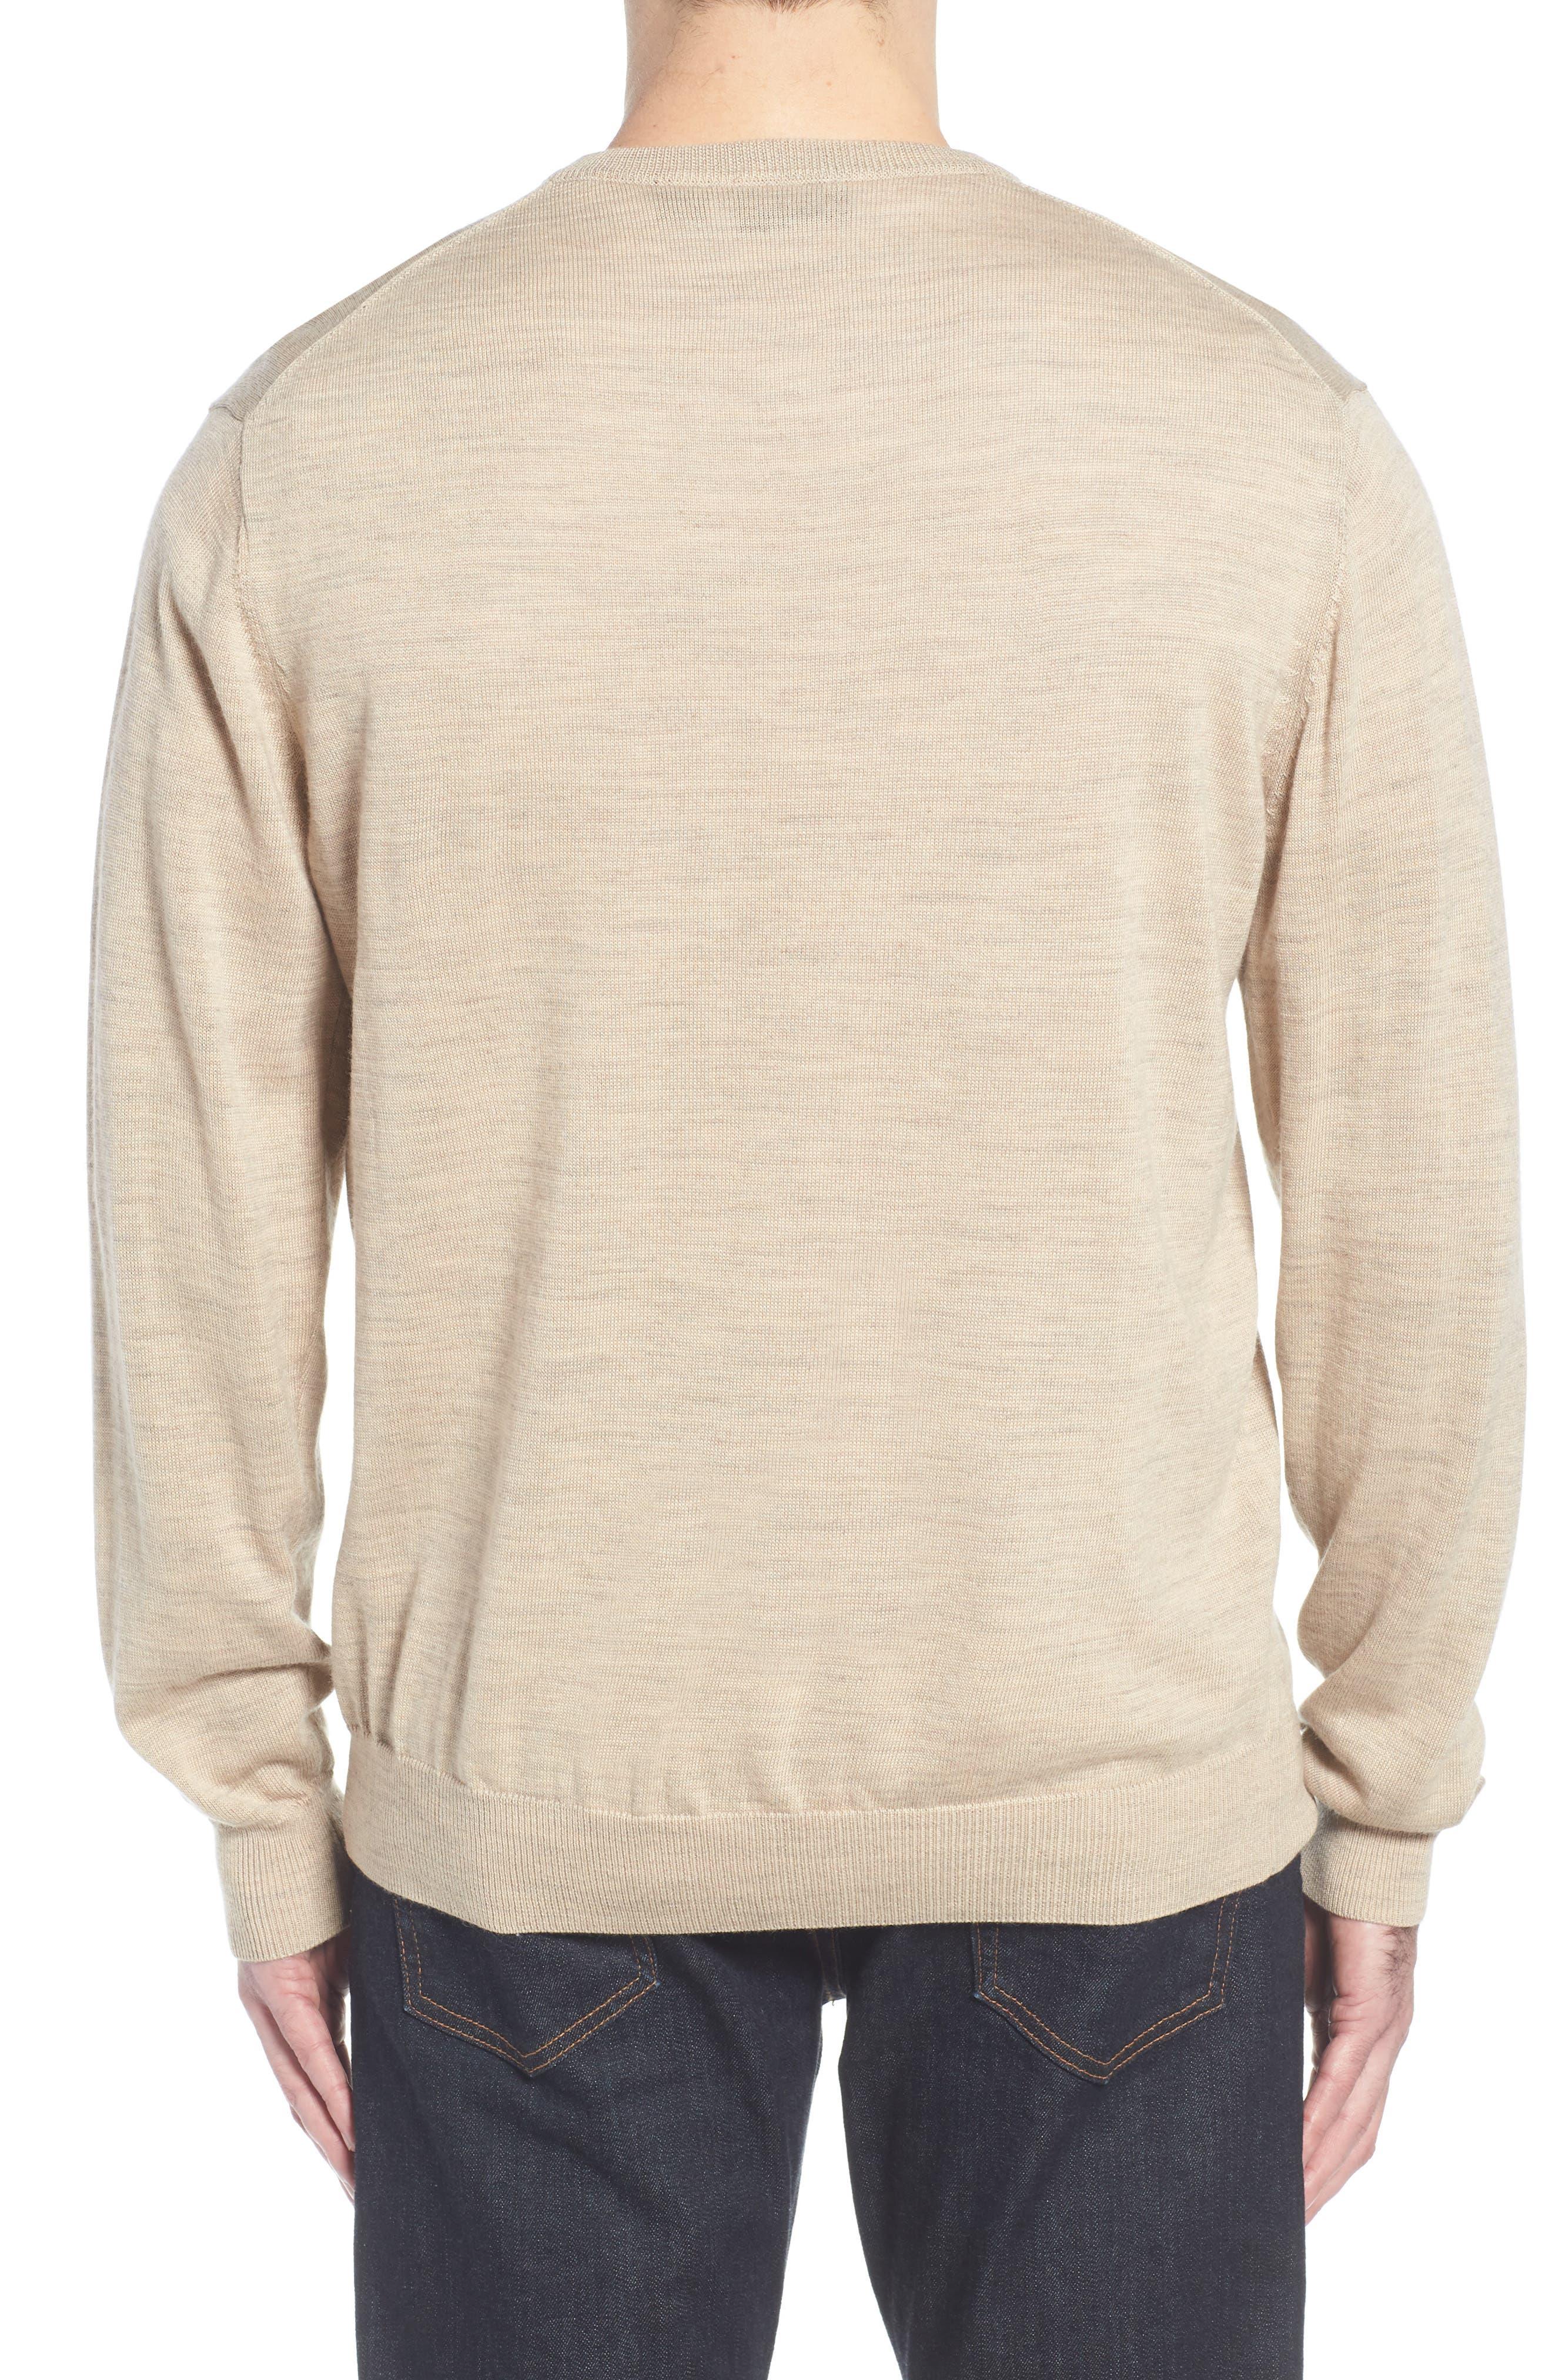 CUTTER & BUCK, 'Douglas' Merino Wool Blend V-Neck Sweater, Alternate thumbnail 2, color, SAND HEATHER